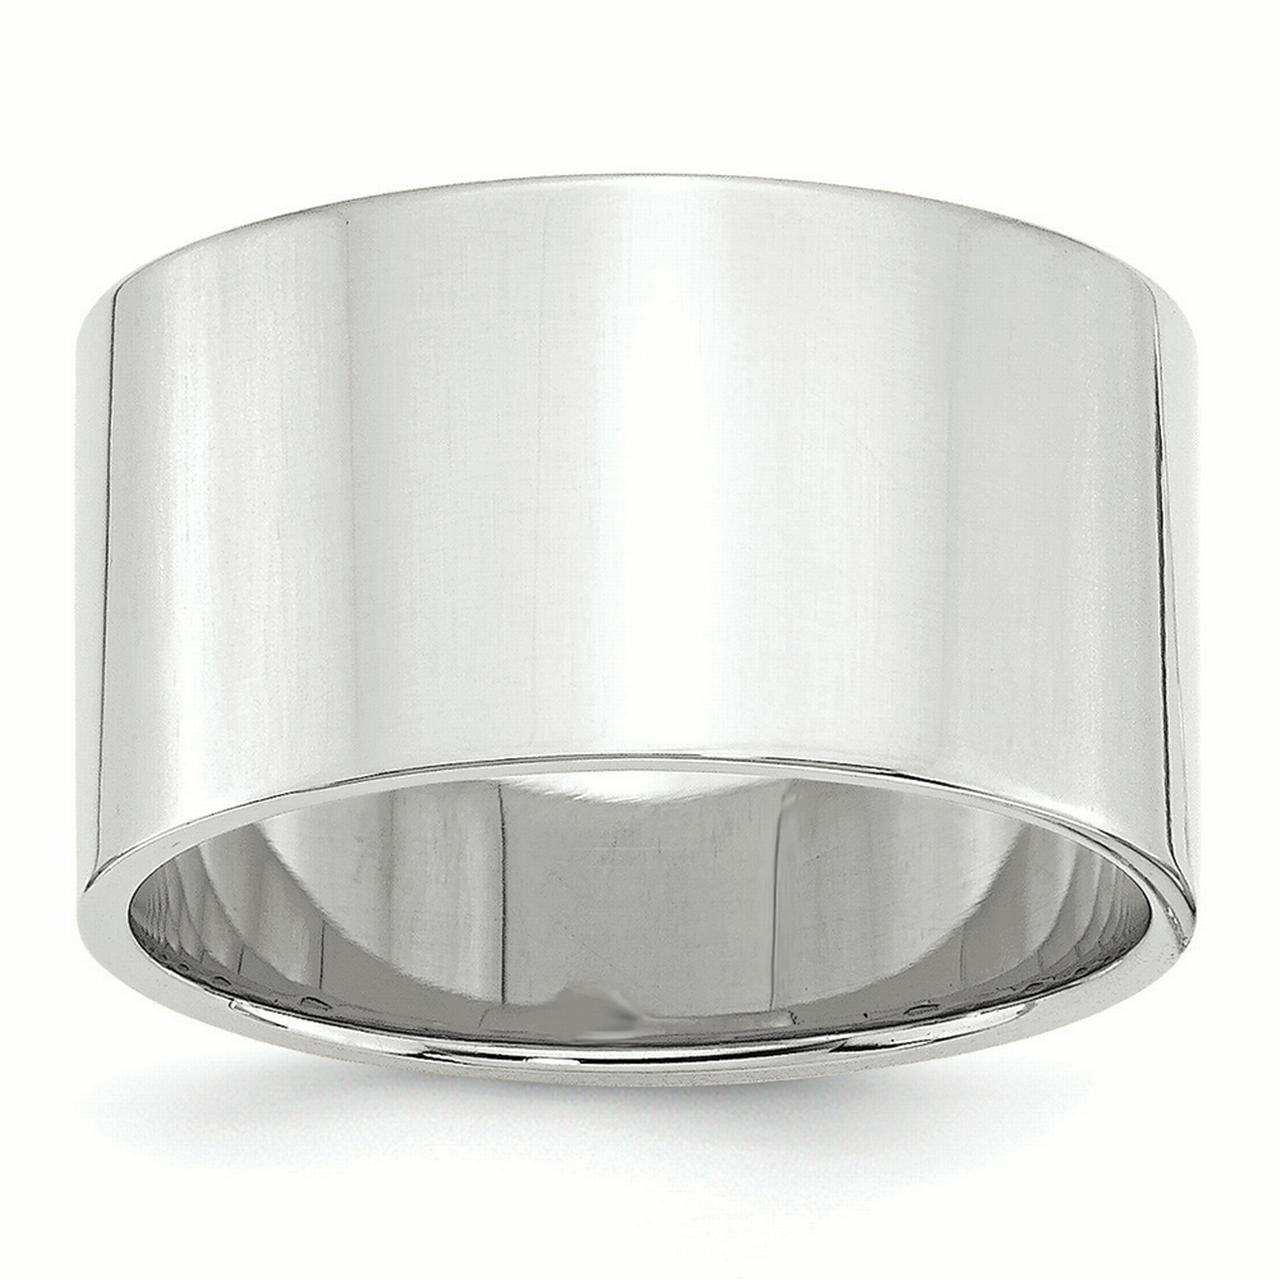 Lex & Lu 14k White Gold 12mm LTW Flat Band Ring